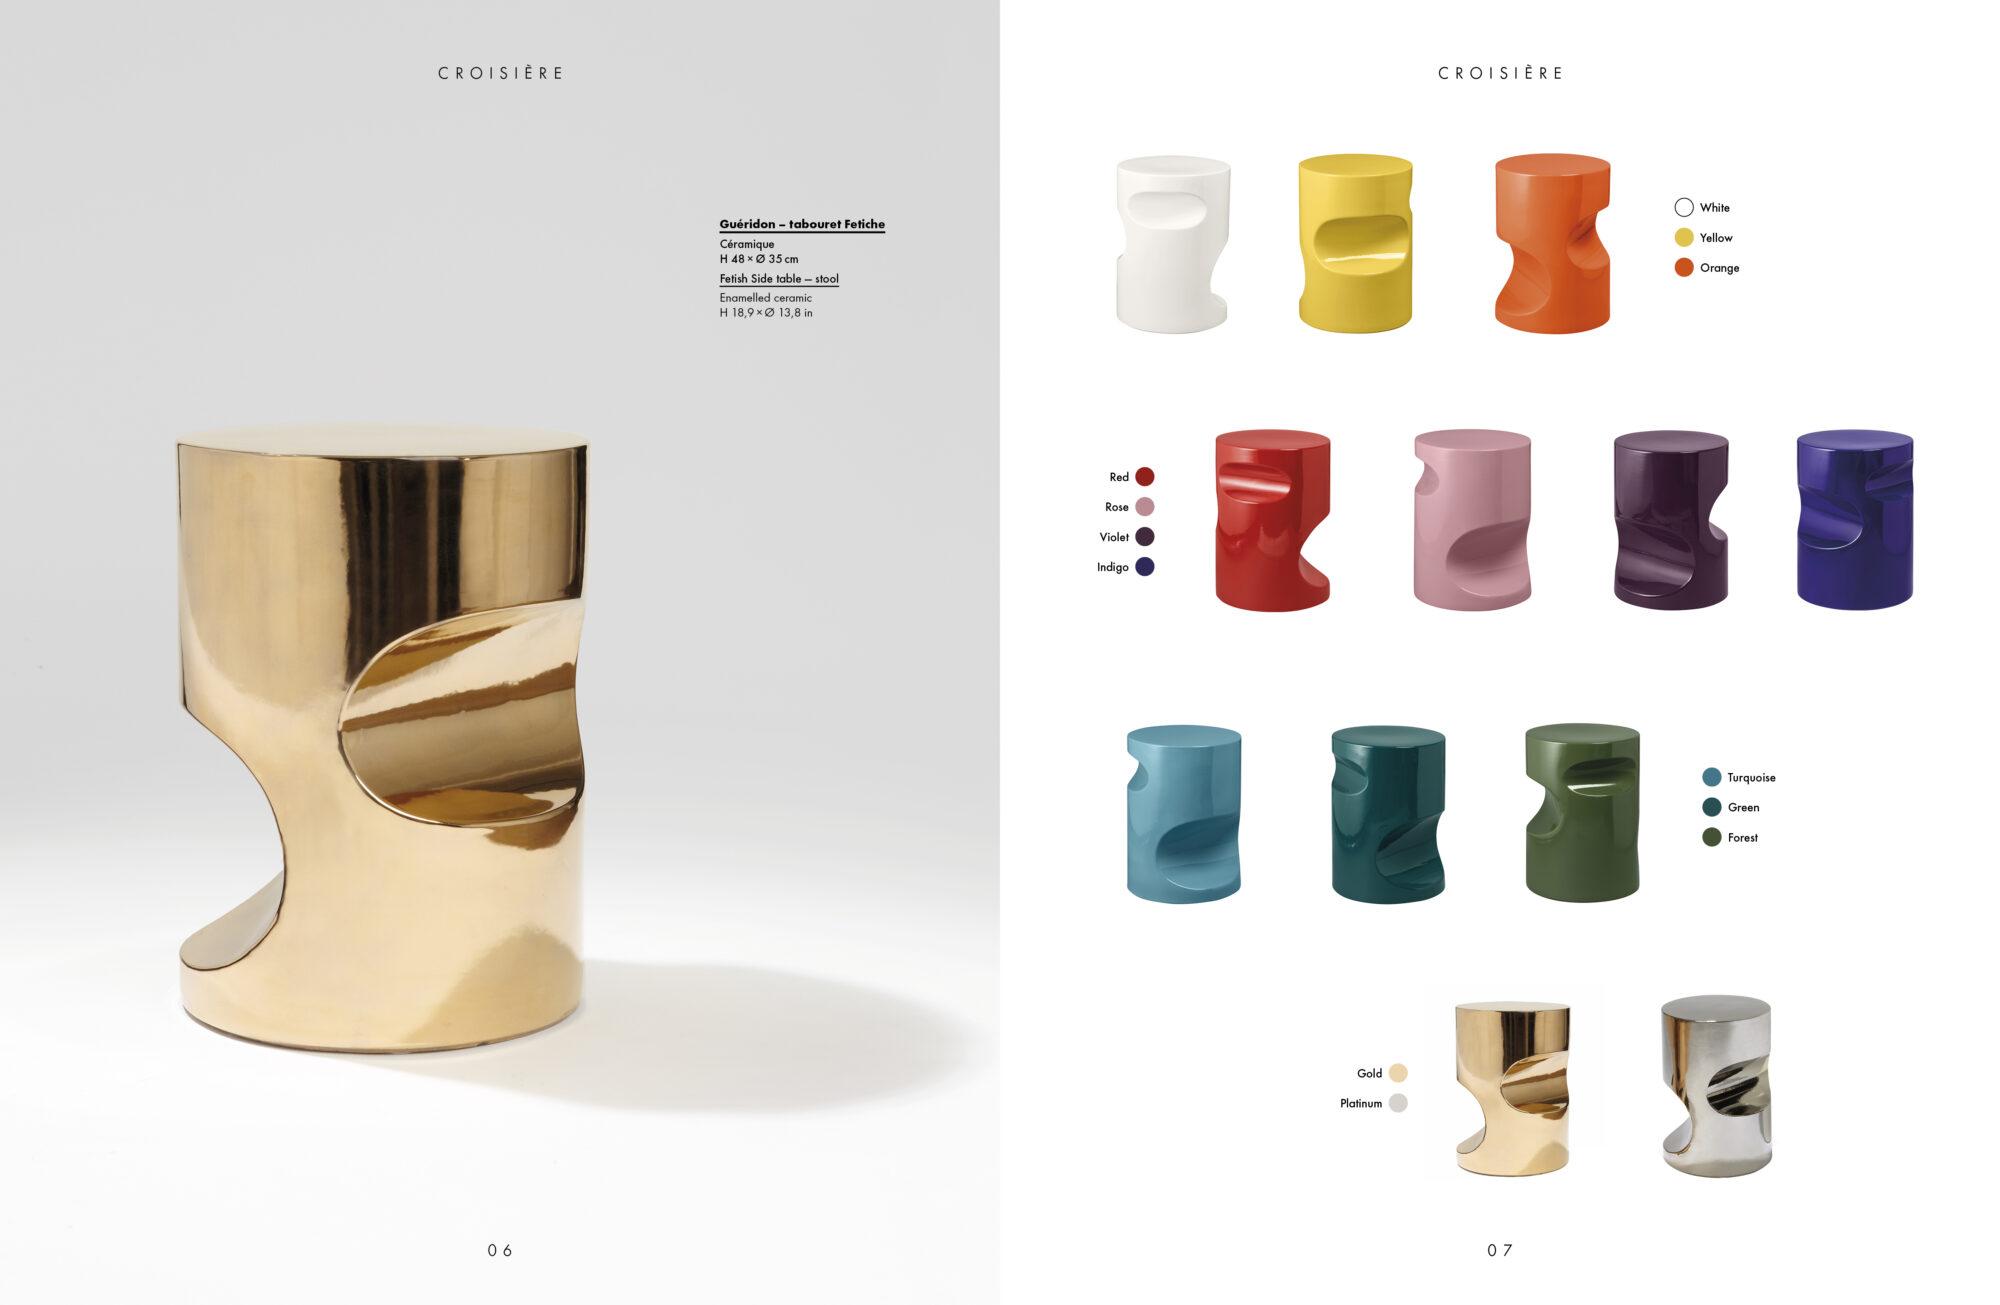 Croisière - Galerie Negropontes